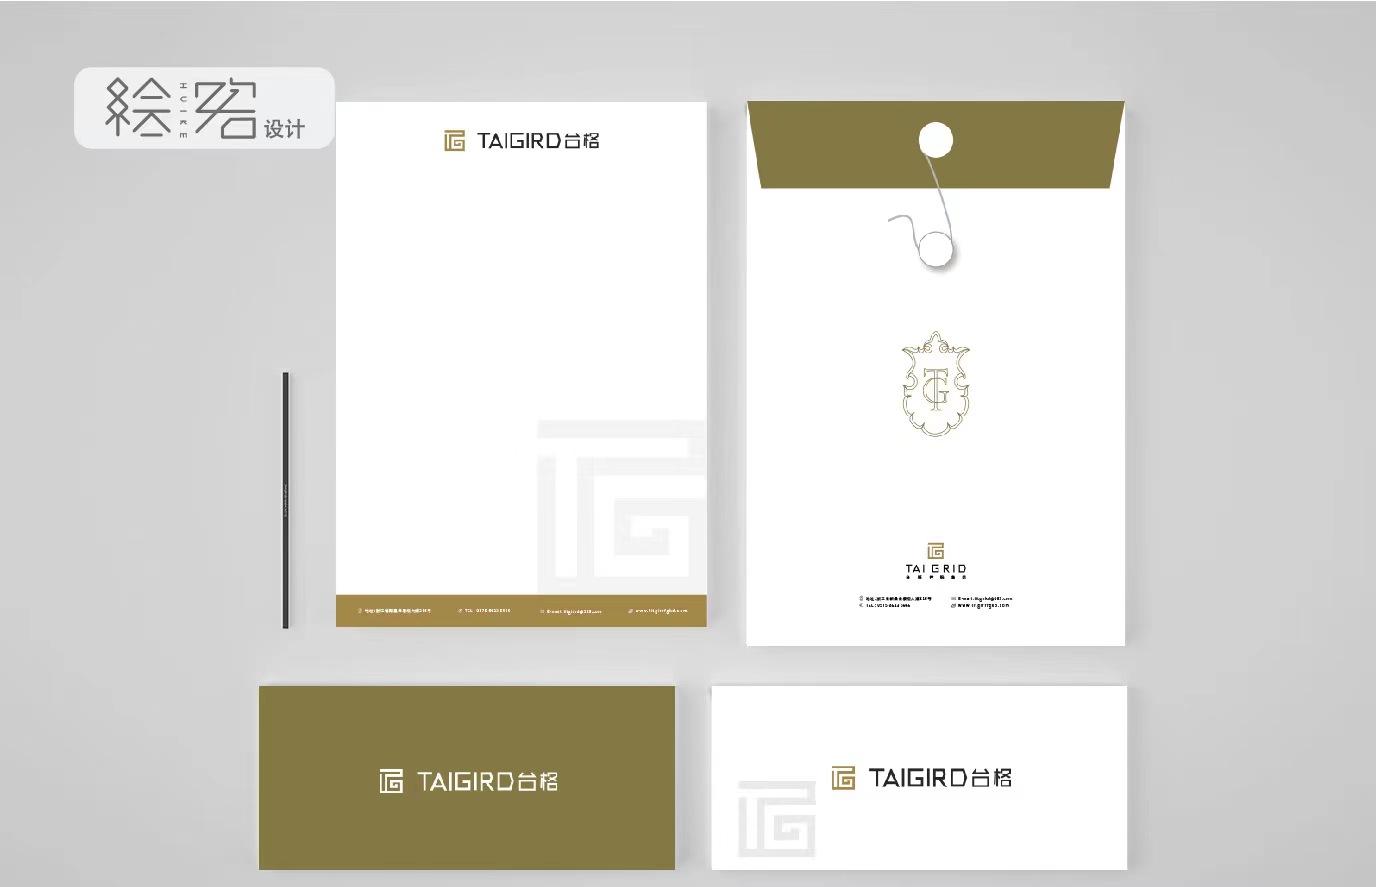 vi导视系统ai企业设计服装品牌策划有限公司餐饮vis设计